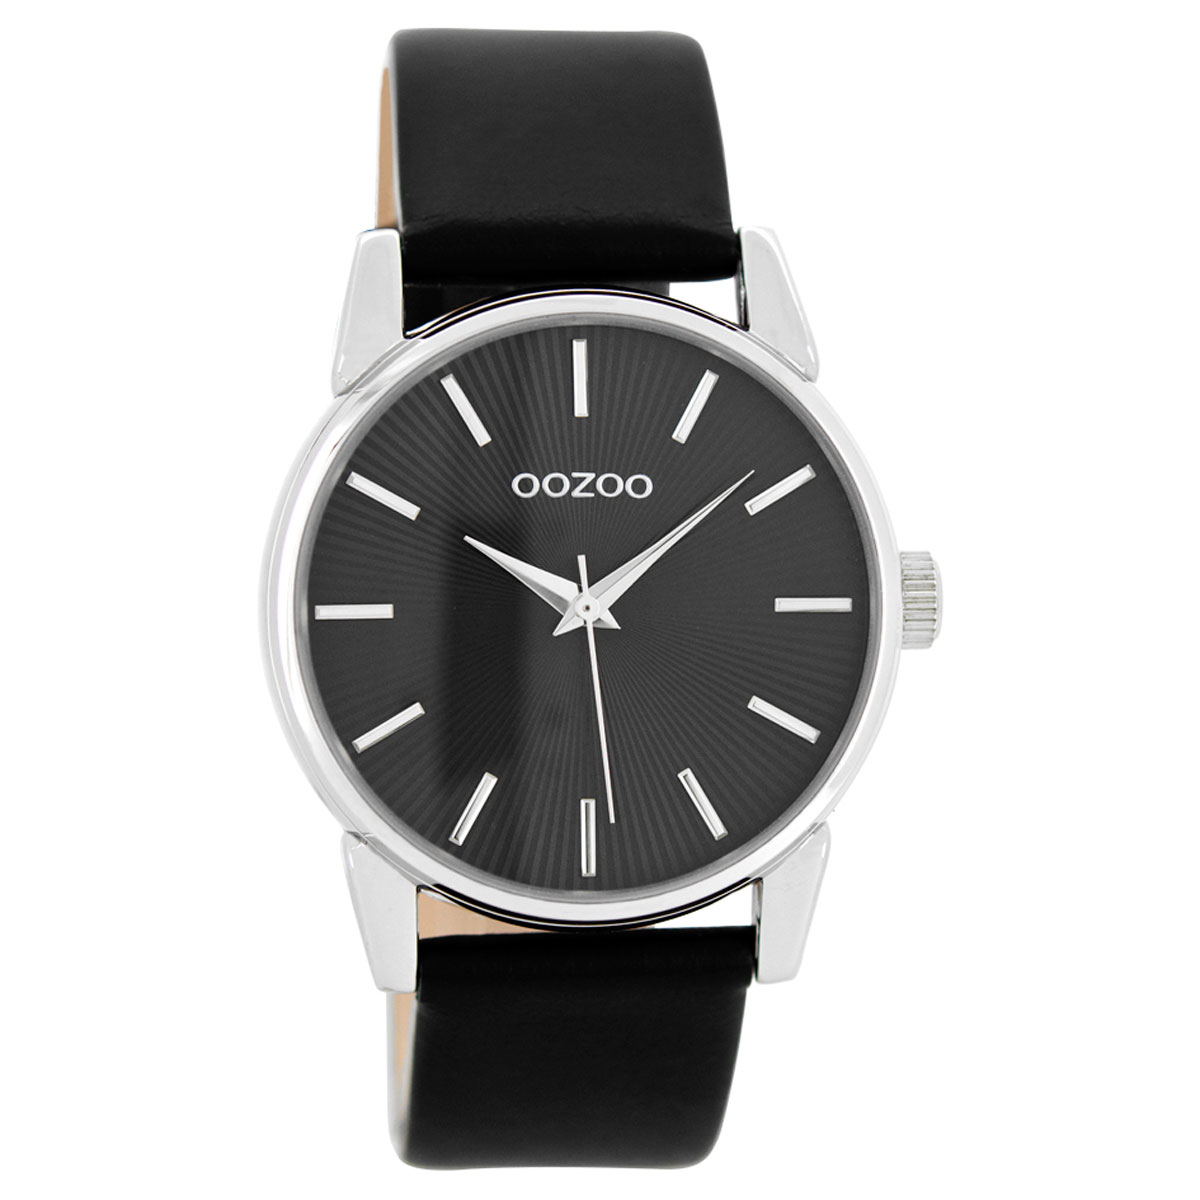 OOZOO Timepieces γυναικείο ρολόι με ασημί μεταλλική κάσα και μαύρο  δερμάτινο λουράκι C8679 1962bf031ec